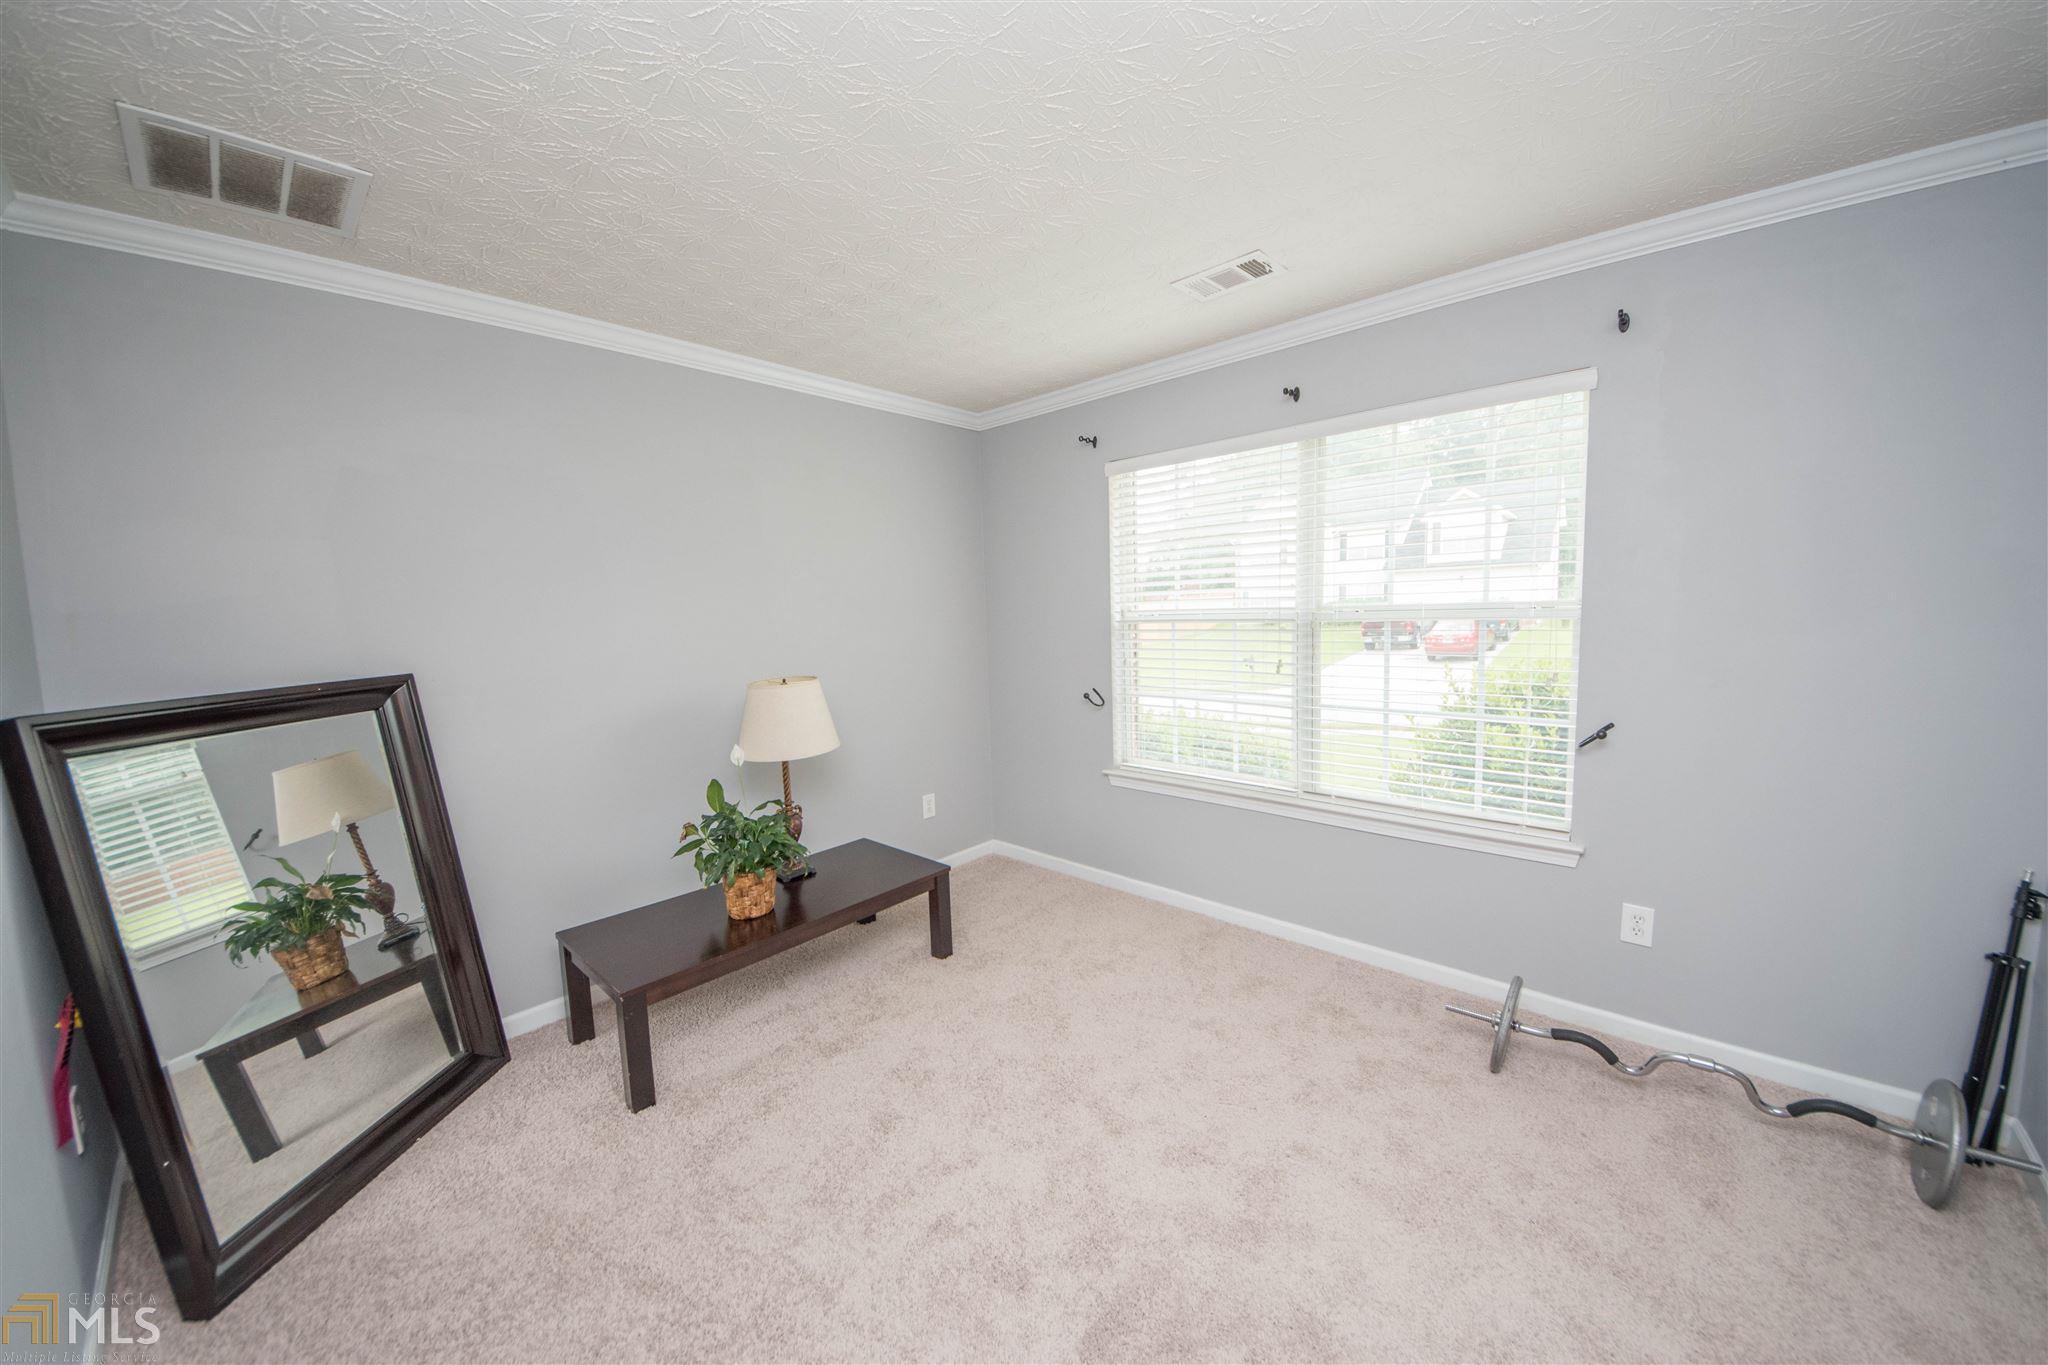 473 Brunswick Cir Stockbridge, GA.   MLS# 8454370   Metro Atlanta Homes For  Sale, Property Search In Metro Atlanta, Metro Atlanta Home Values, Metro  Atlanta ...